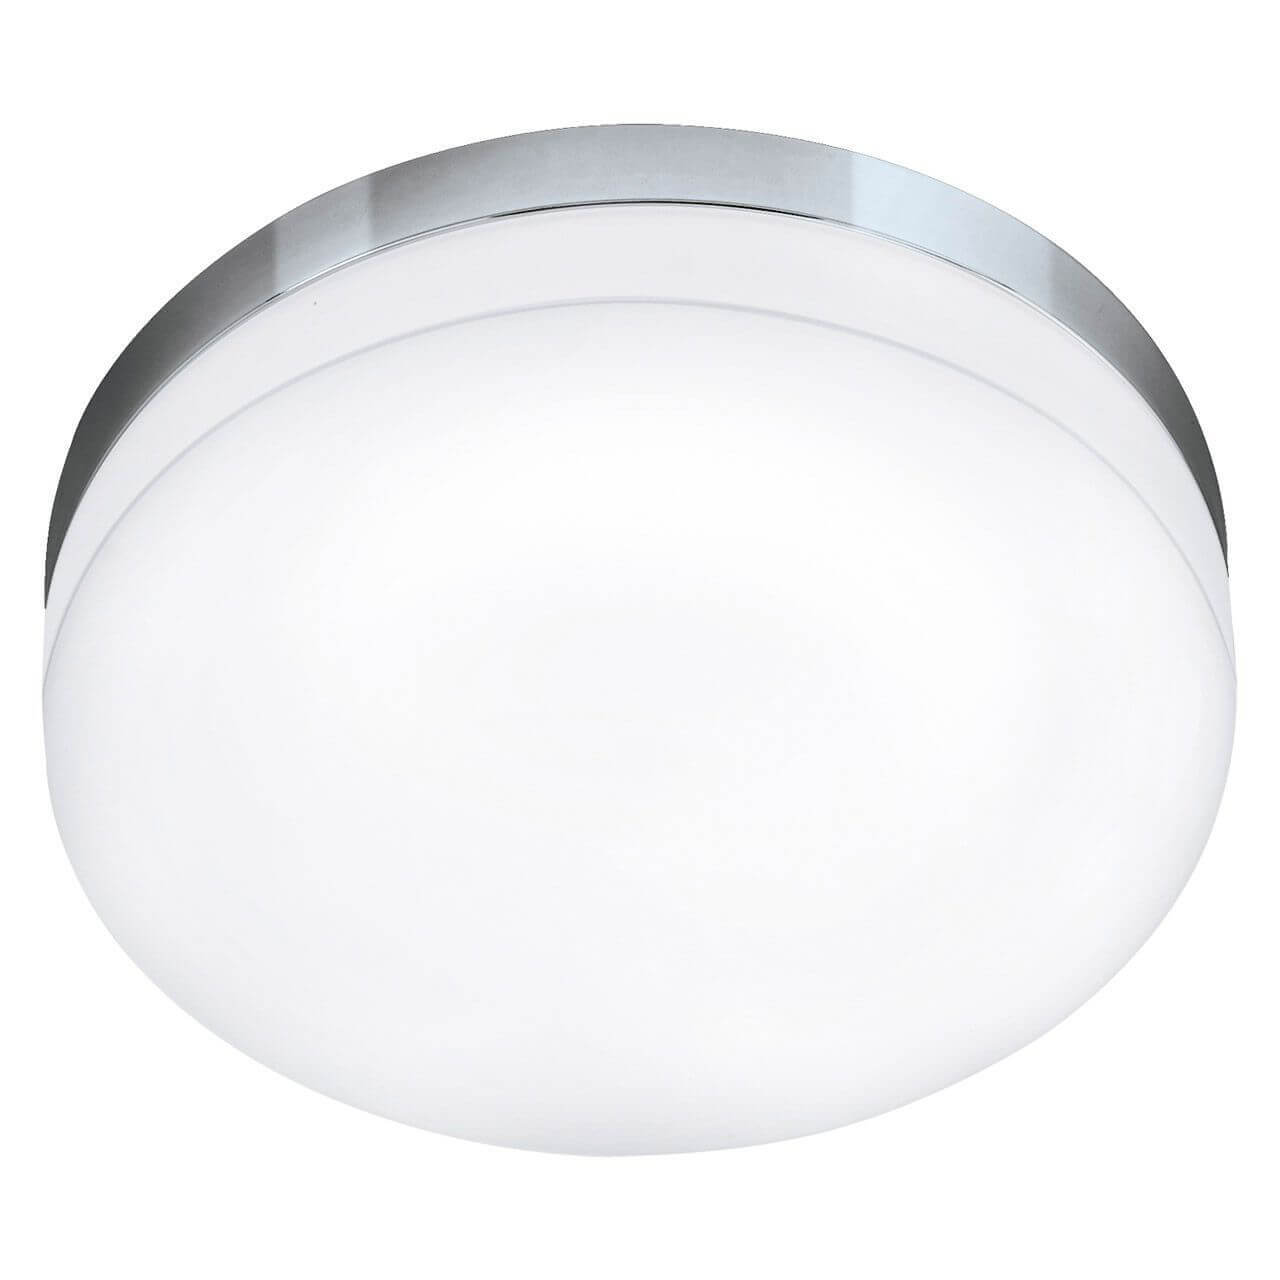 Светильник Eglo 95001 Lora